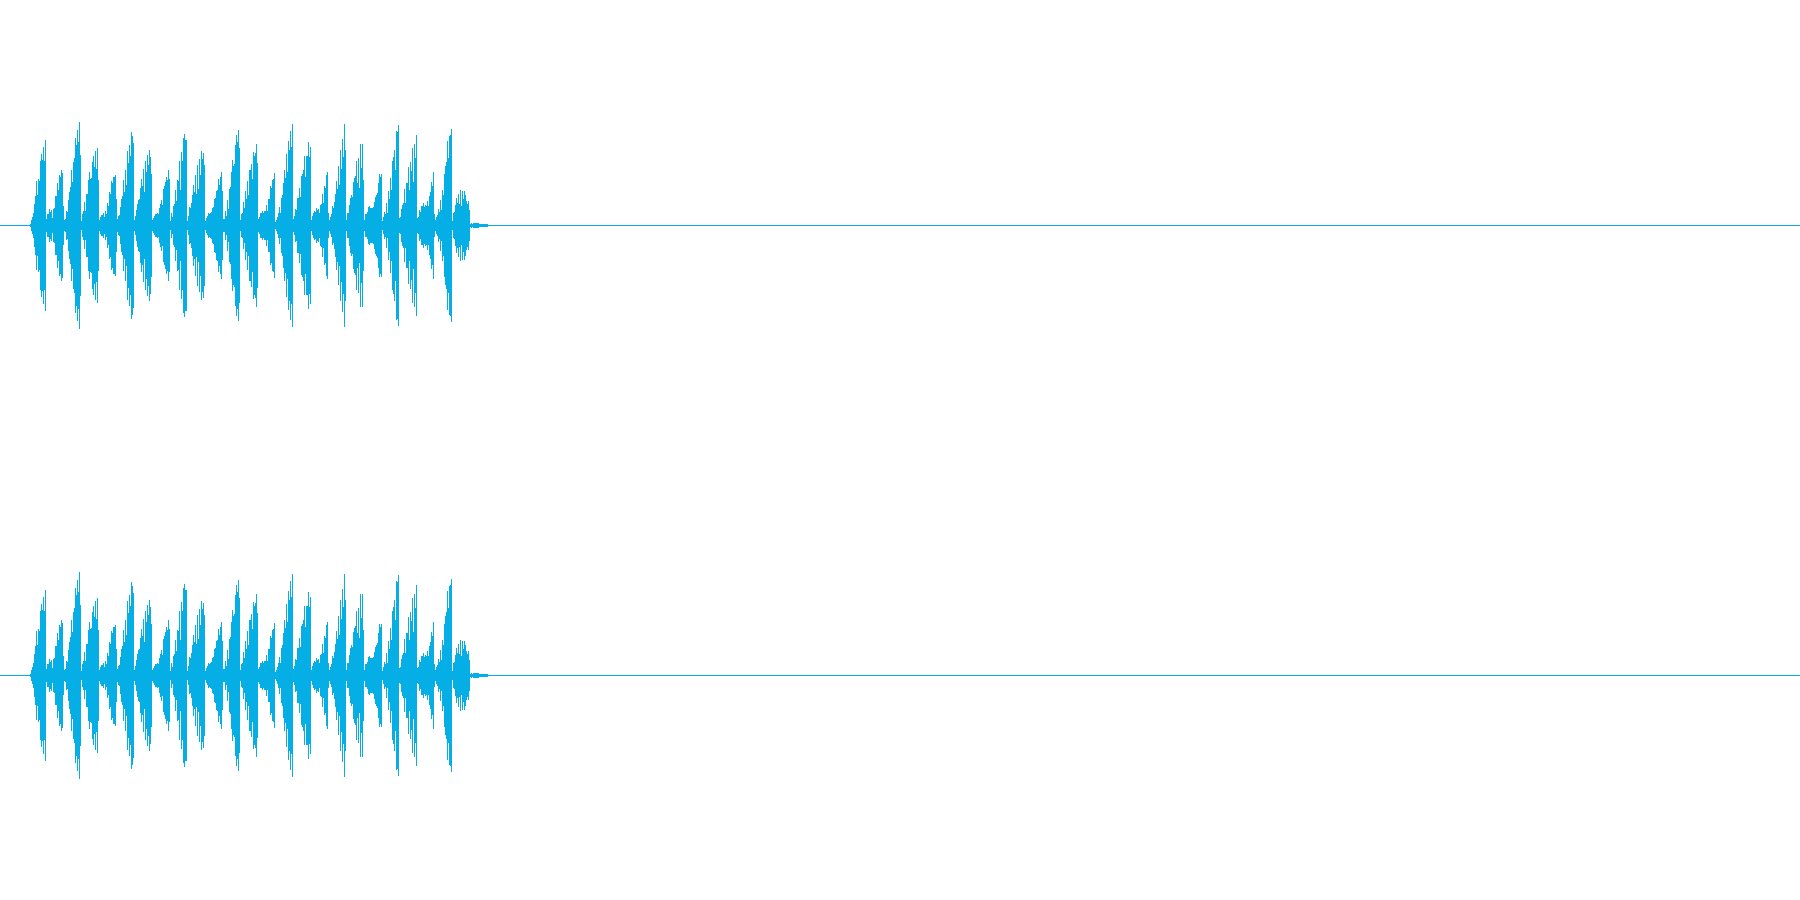 NPC会話音(声が低い)の再生済みの波形